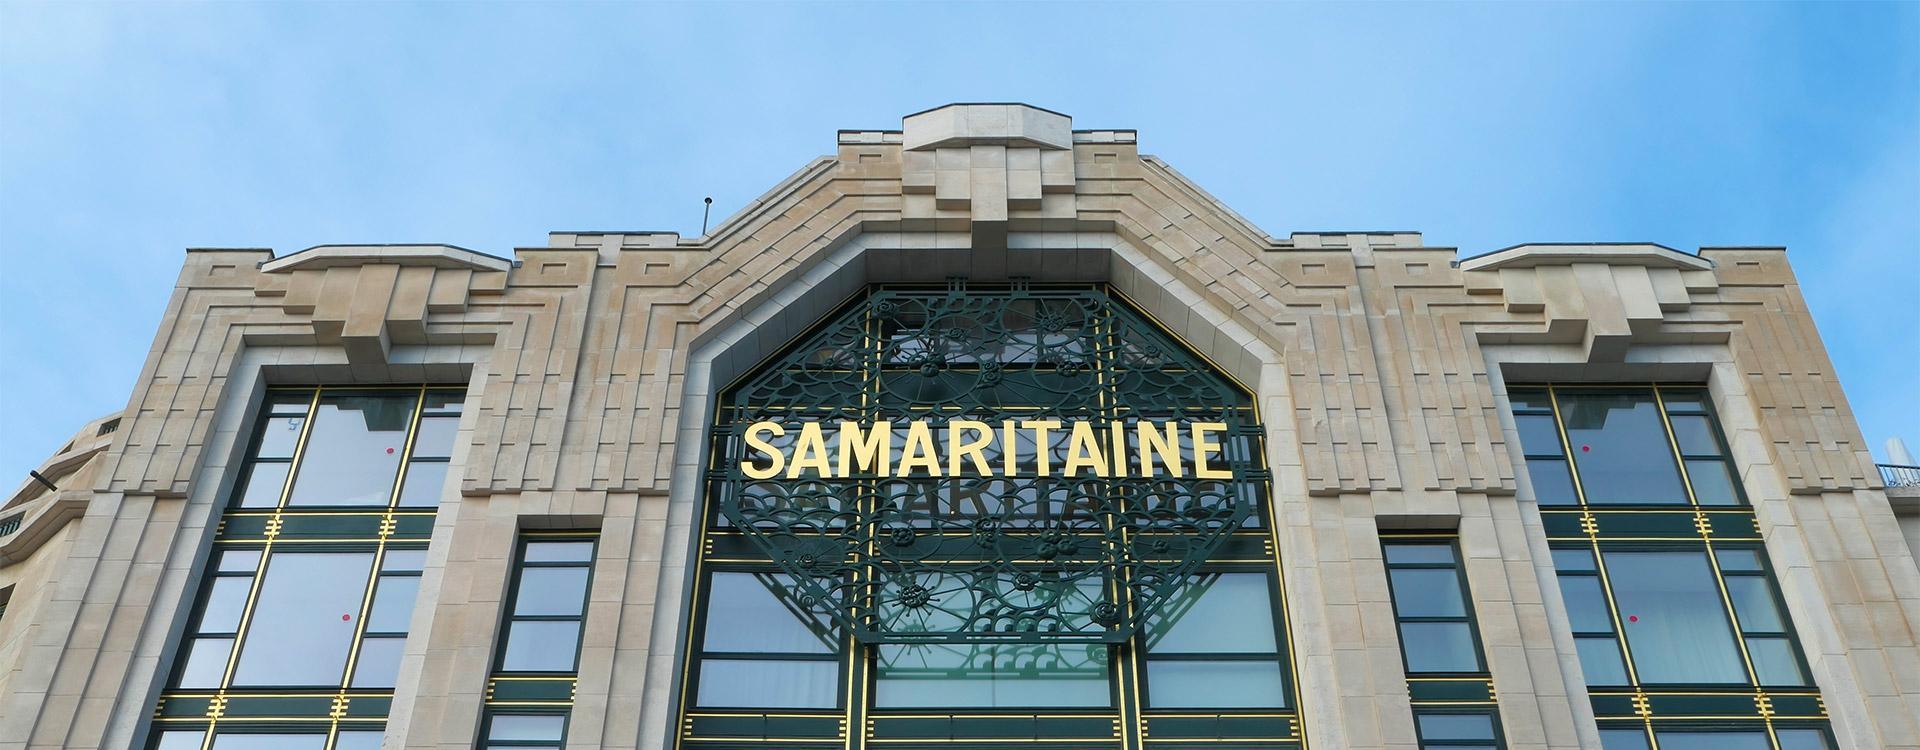 La Samaritaine rouvre ses portes (C1/C2)